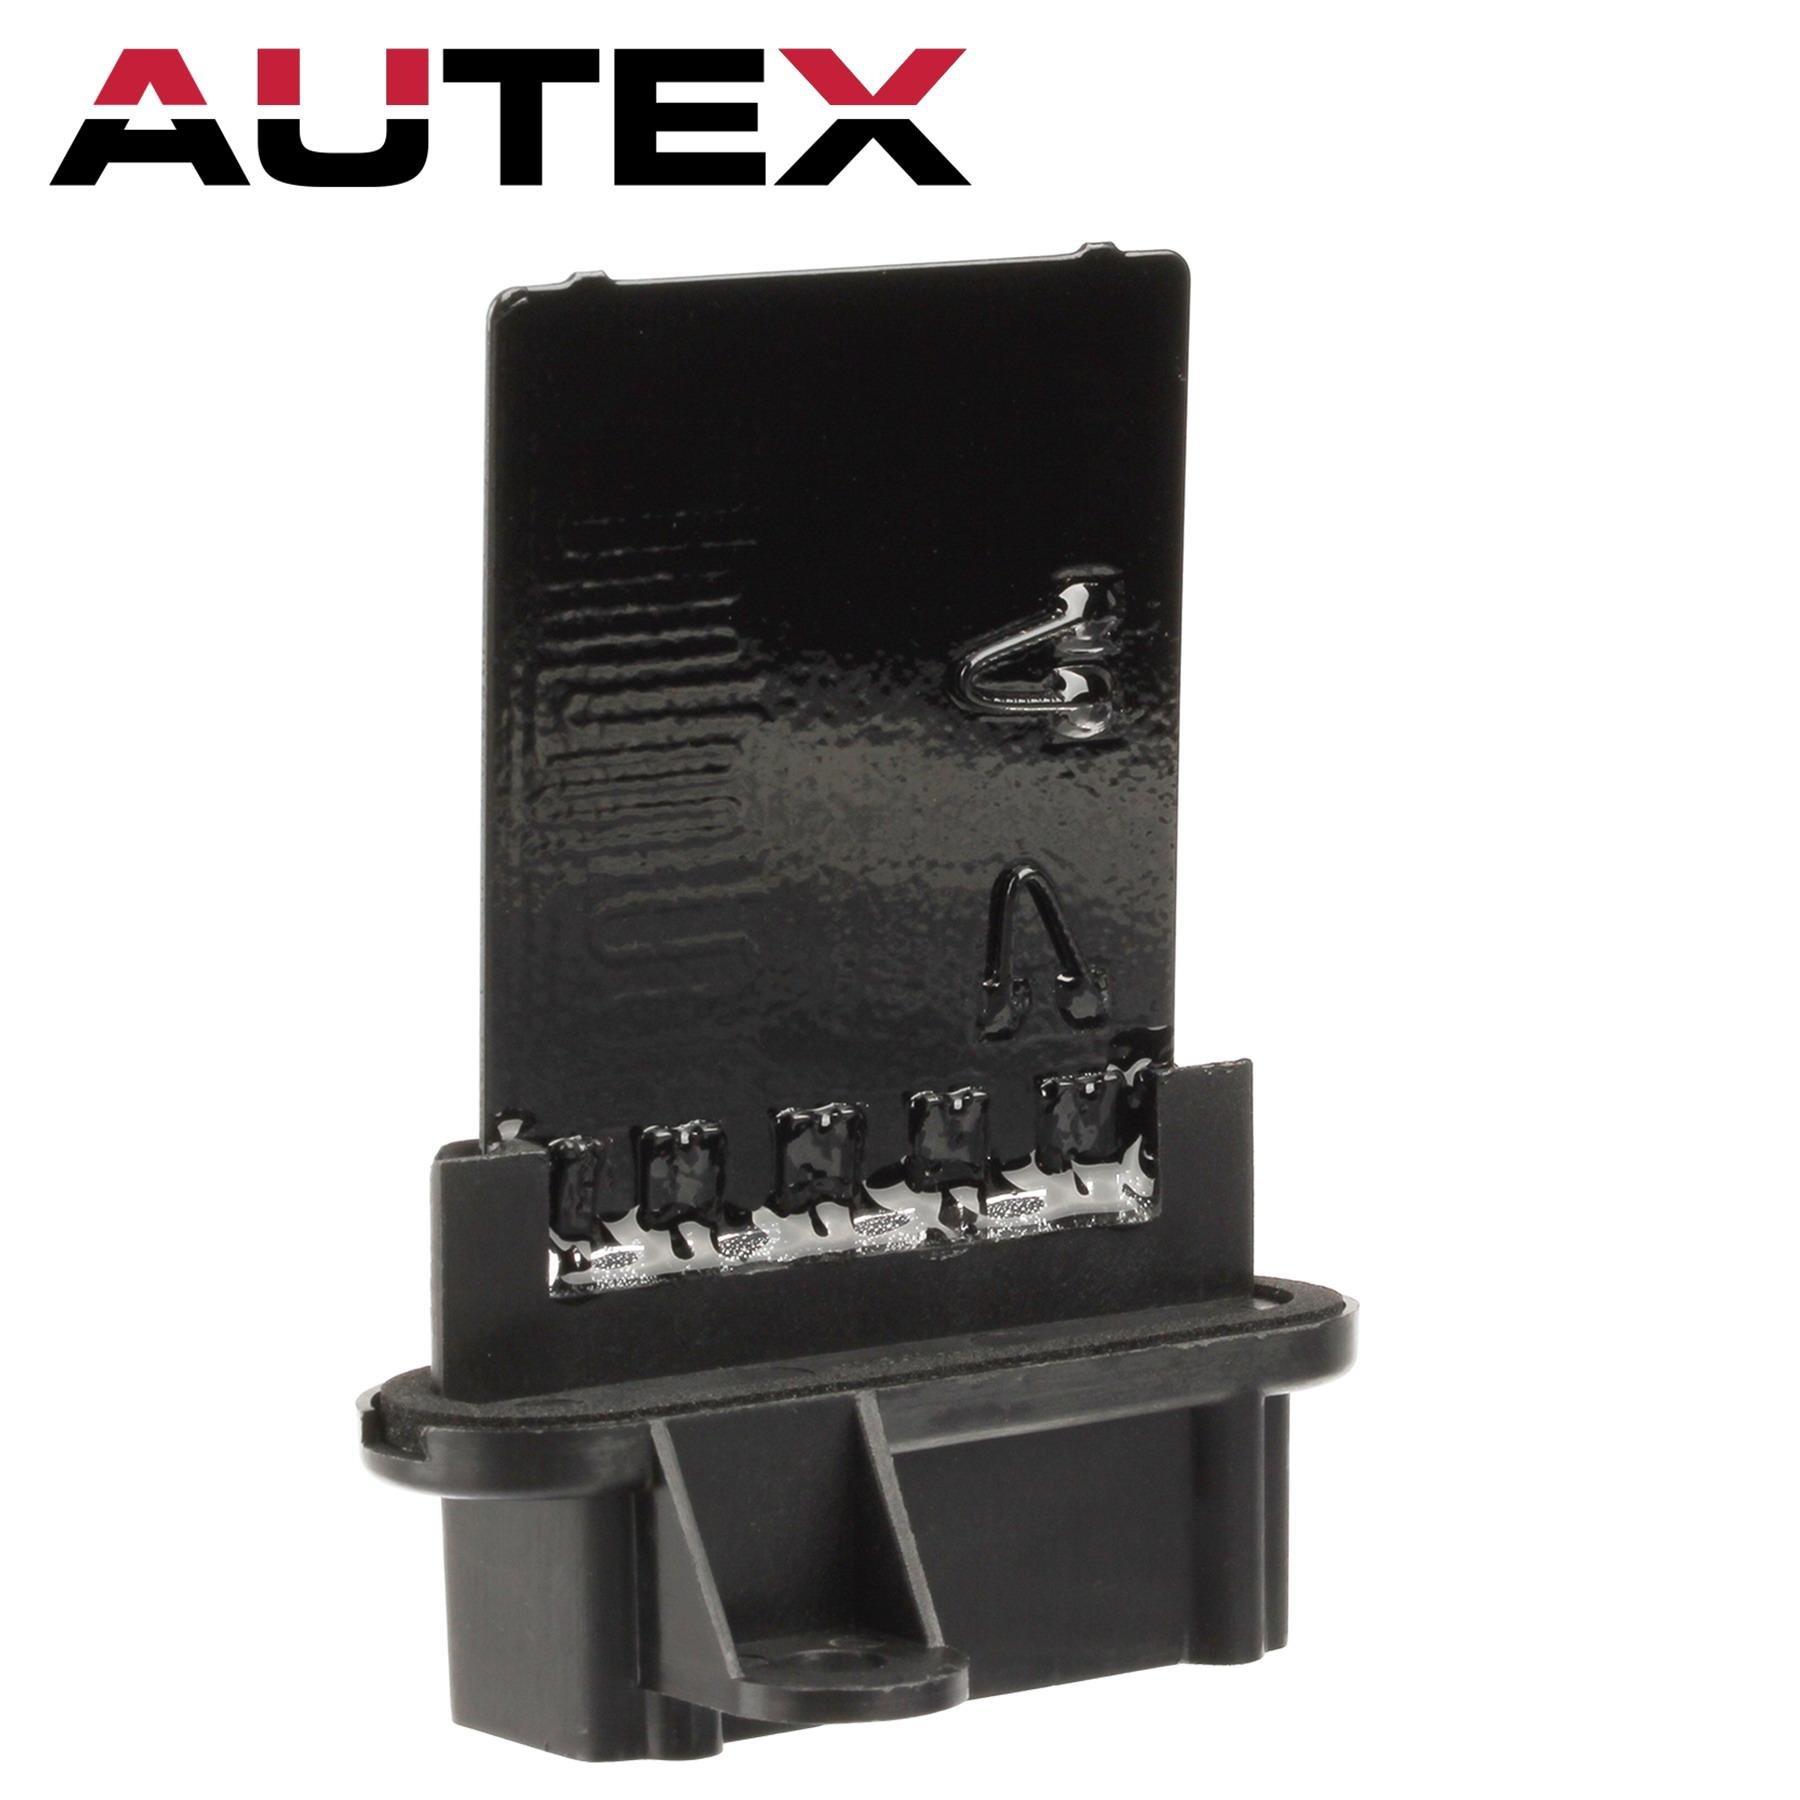 AUTEX HVAC Blower Motor Resistor Module 5139719AA RU-352 5066552AA 973-025 Replacement for 2002 2003 2004 2005 2006 2007 Jeep Liberty 2002 2003 2004 2005 2006 Jeep Wrangler